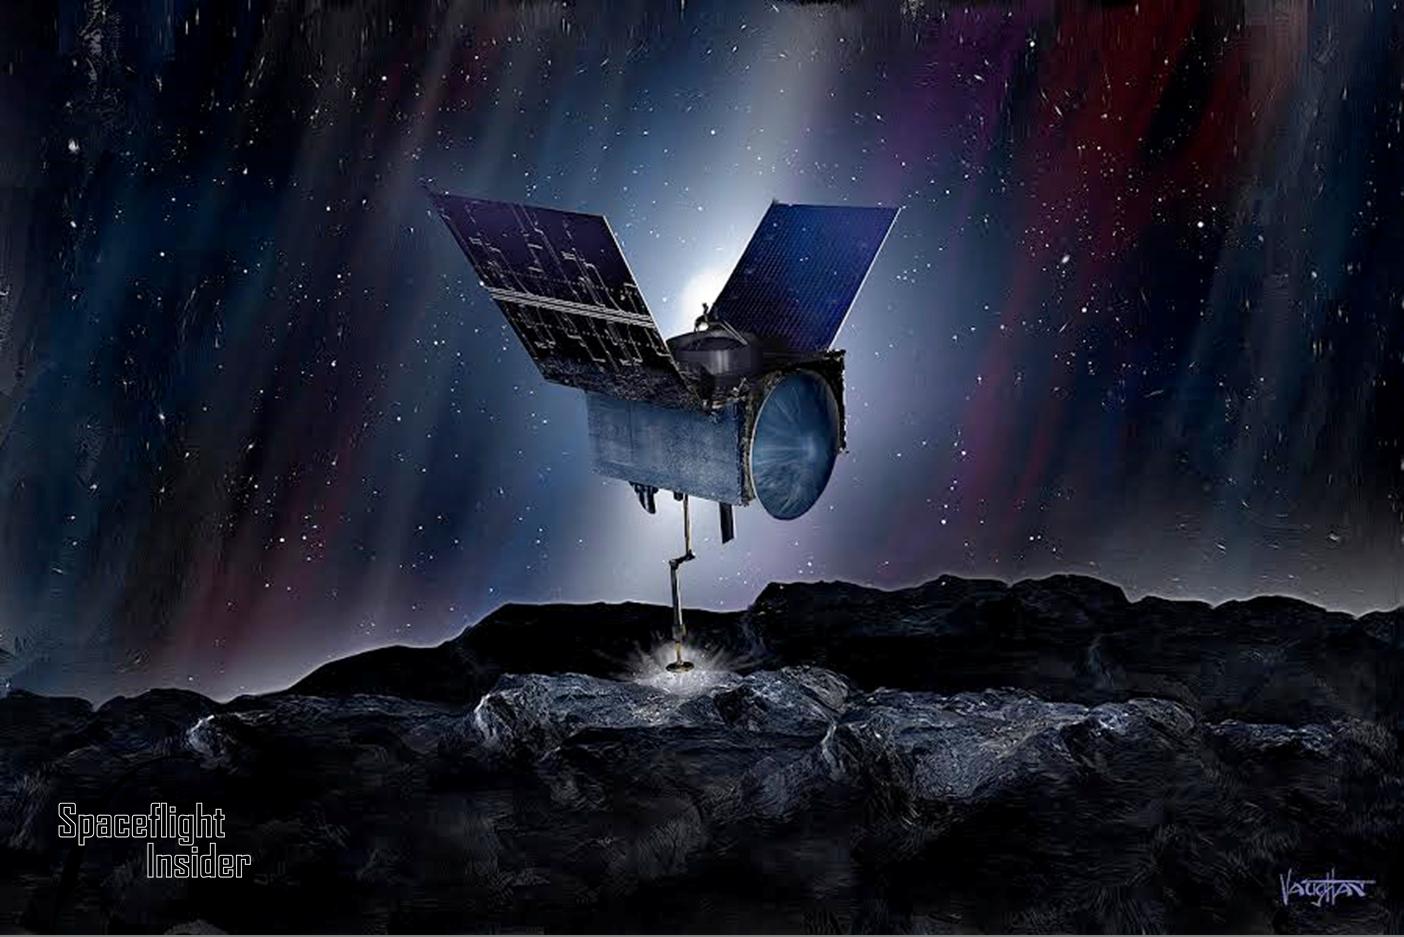 osiris-rex-above-asteroid-bennu-image-credit-james-vaughan-spaceflight-insider